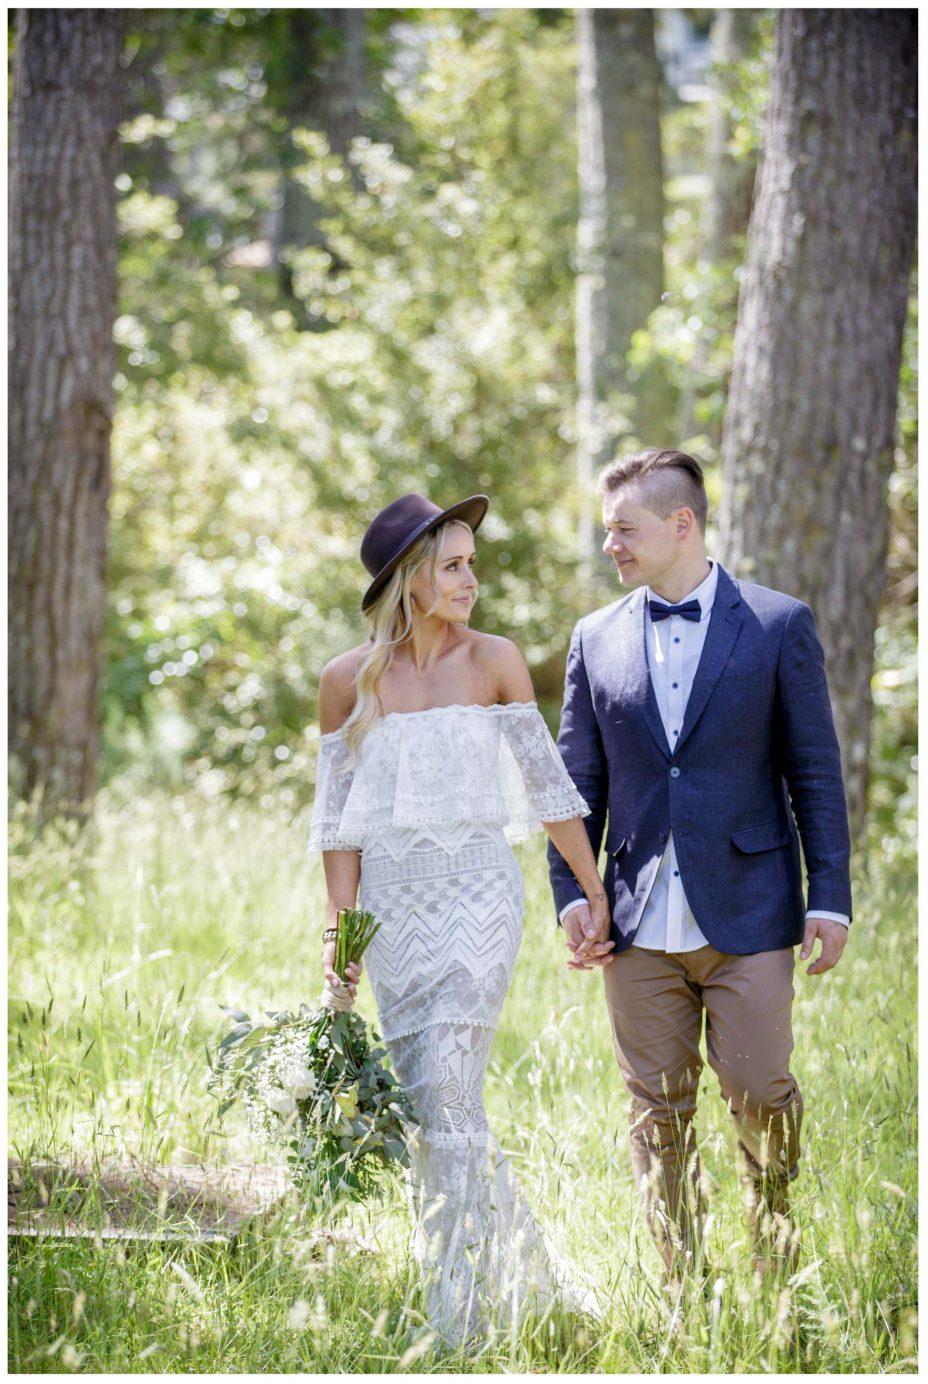 Aussie bride and groom walk together in teh woods, Murawai Beech wedding, Auckland New Zealand